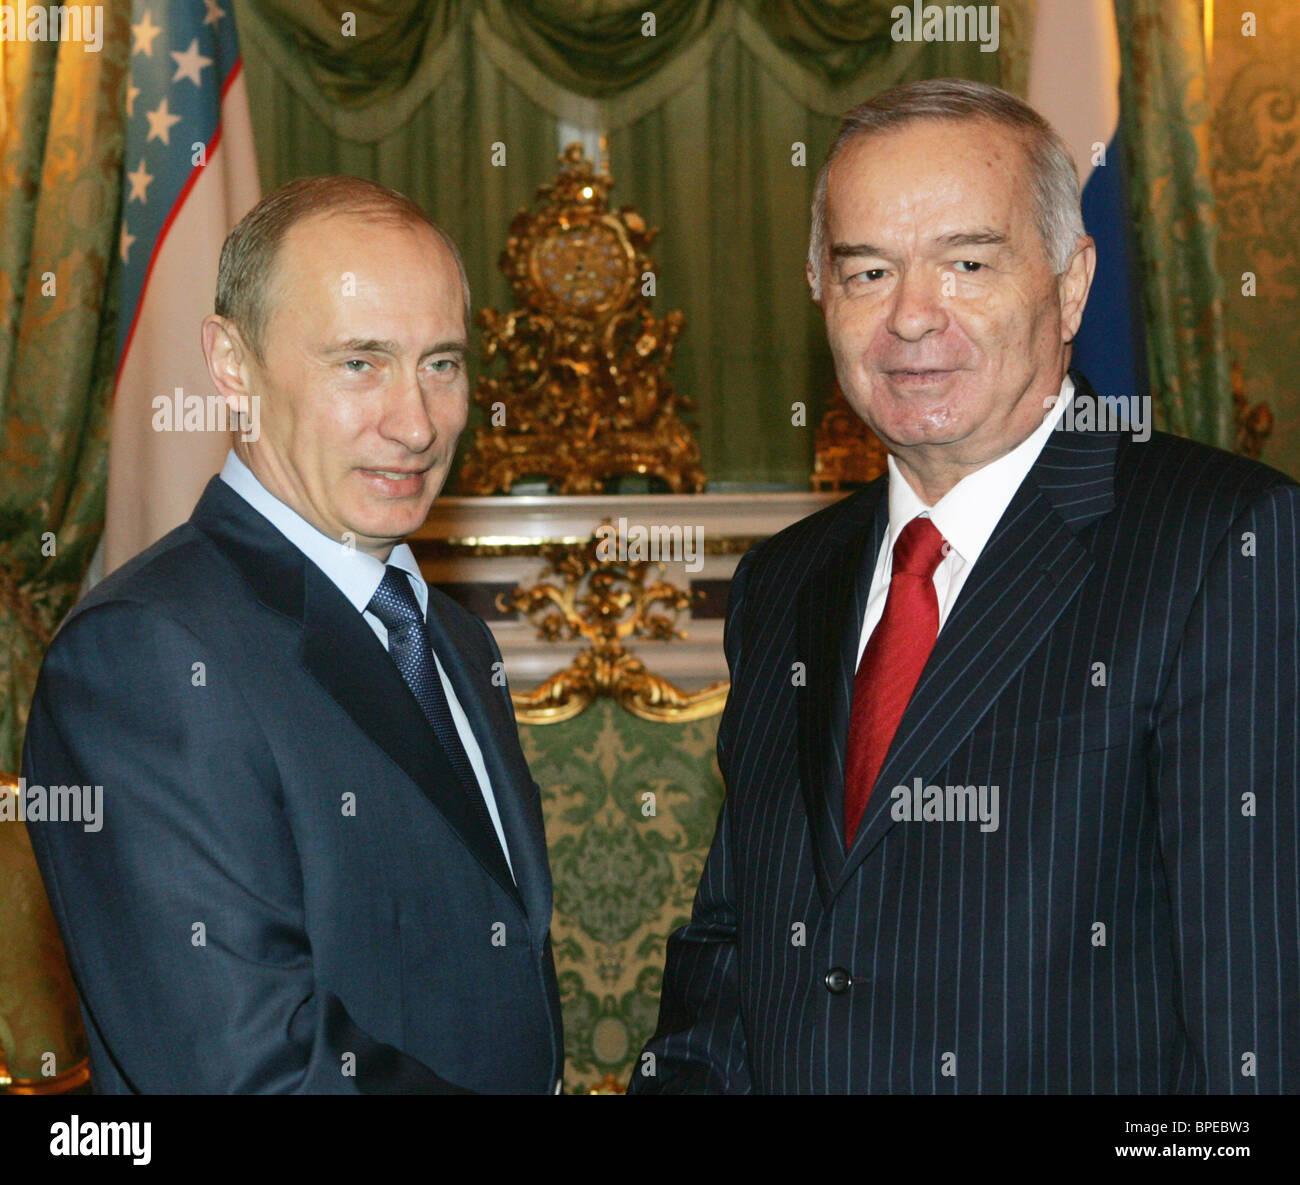 Russian President Vladimir Putin meets Uzbekistan's President Islam Karimov in Kremlin - Stock Image